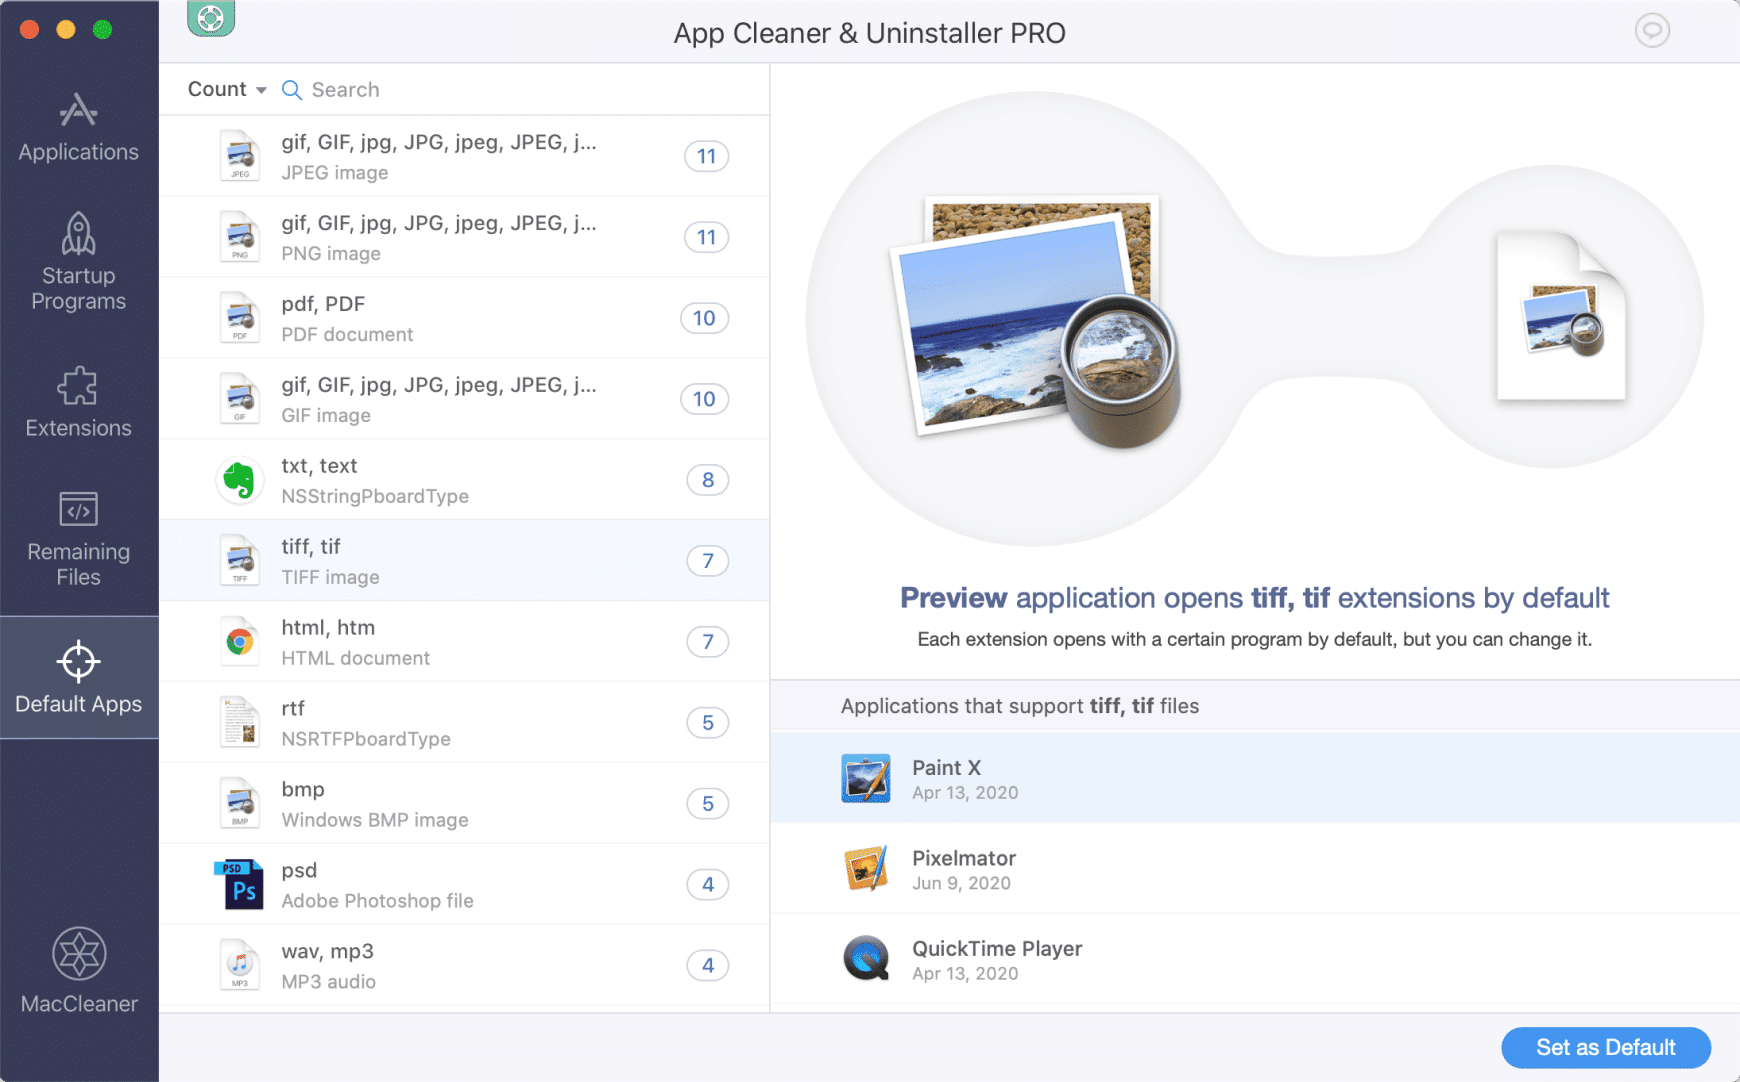 App Cleaner & Uninstaller window showing Default Apps section